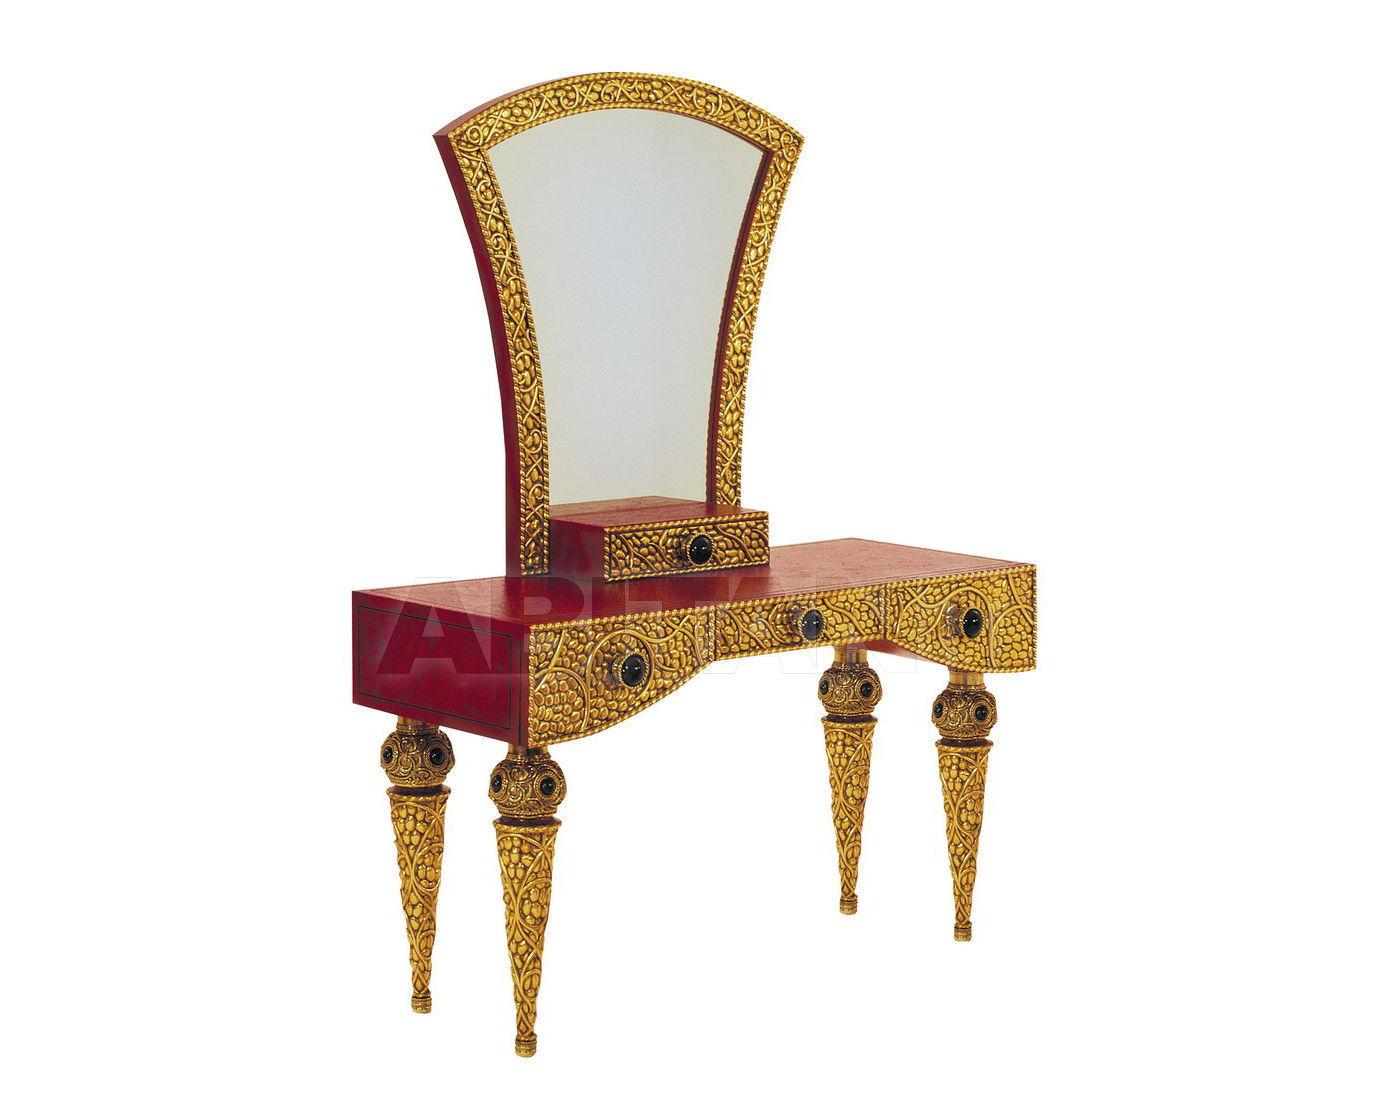 Купить Столик туалетный Colombostile s.p.a. Transculture/rouge Et Or 1776 TLA